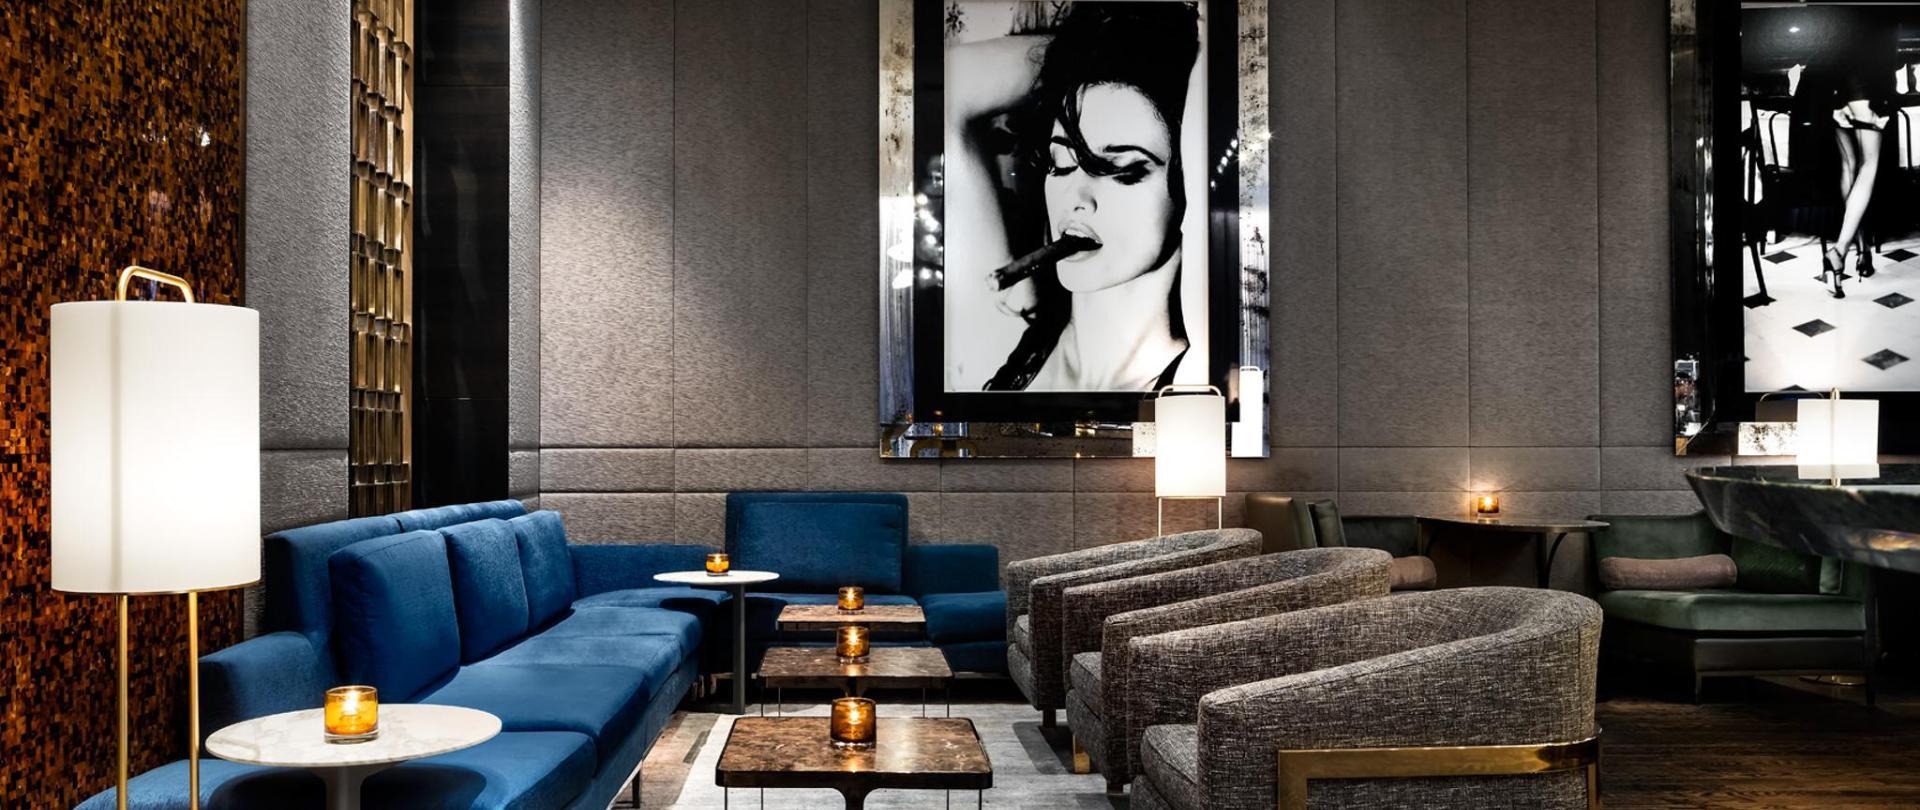 The Hazelton Hotel Ultra Luxury Hotel In Yorkville Toronto